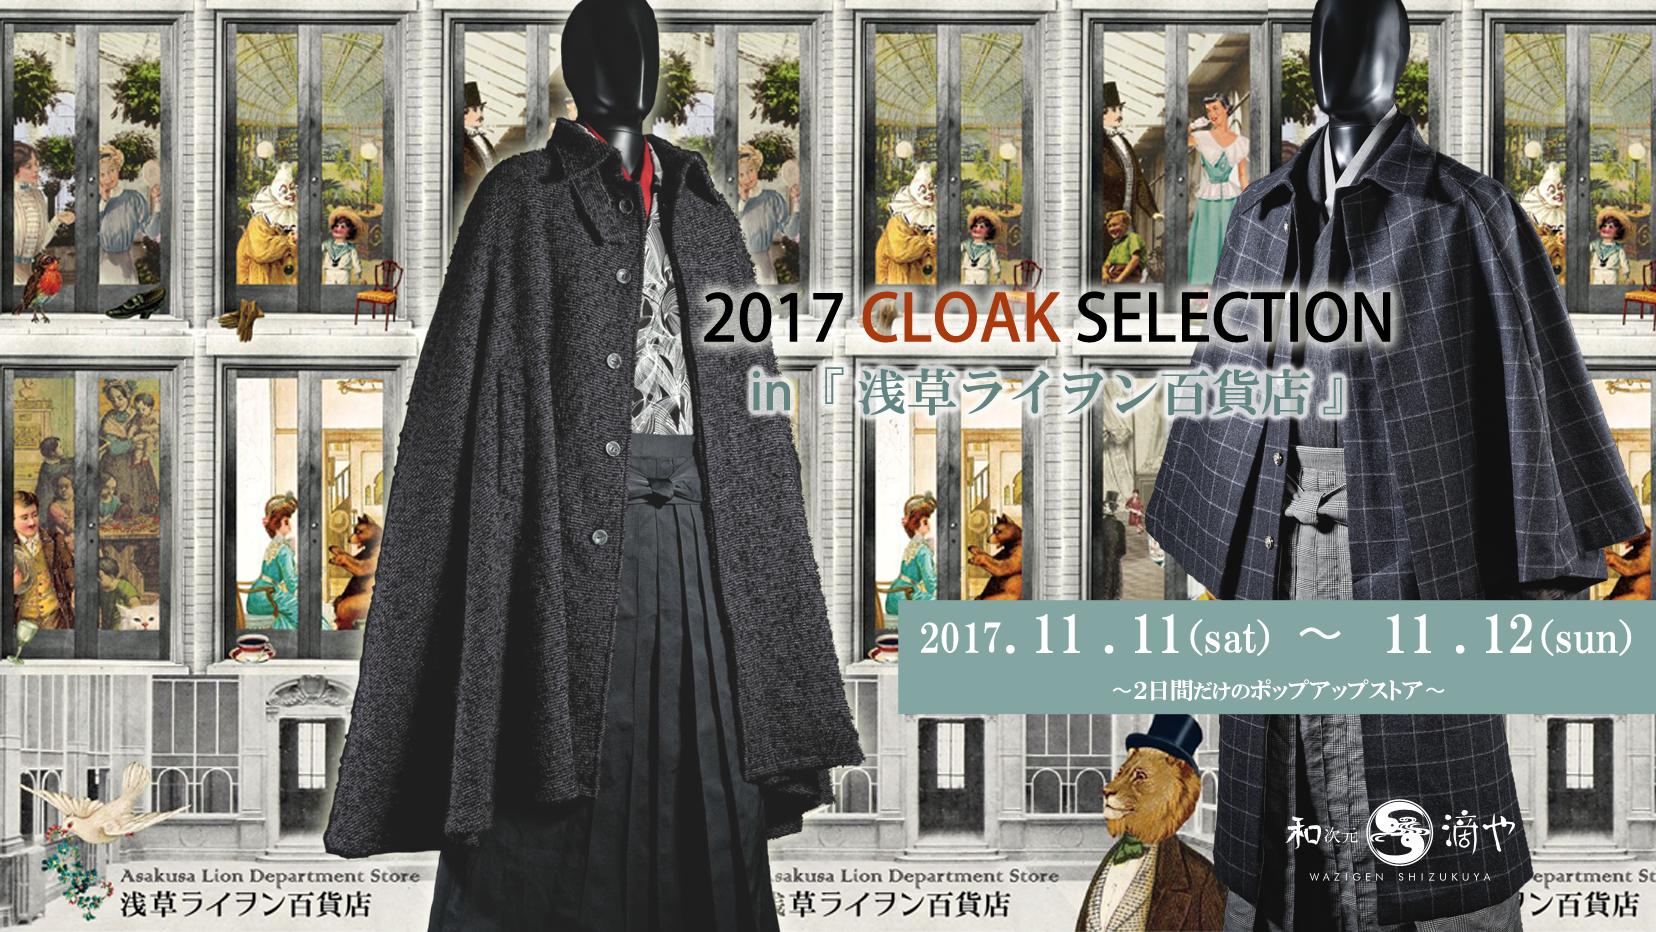 Cloak Selection in『浅草ライヲン百貨店 』<'17 秋>